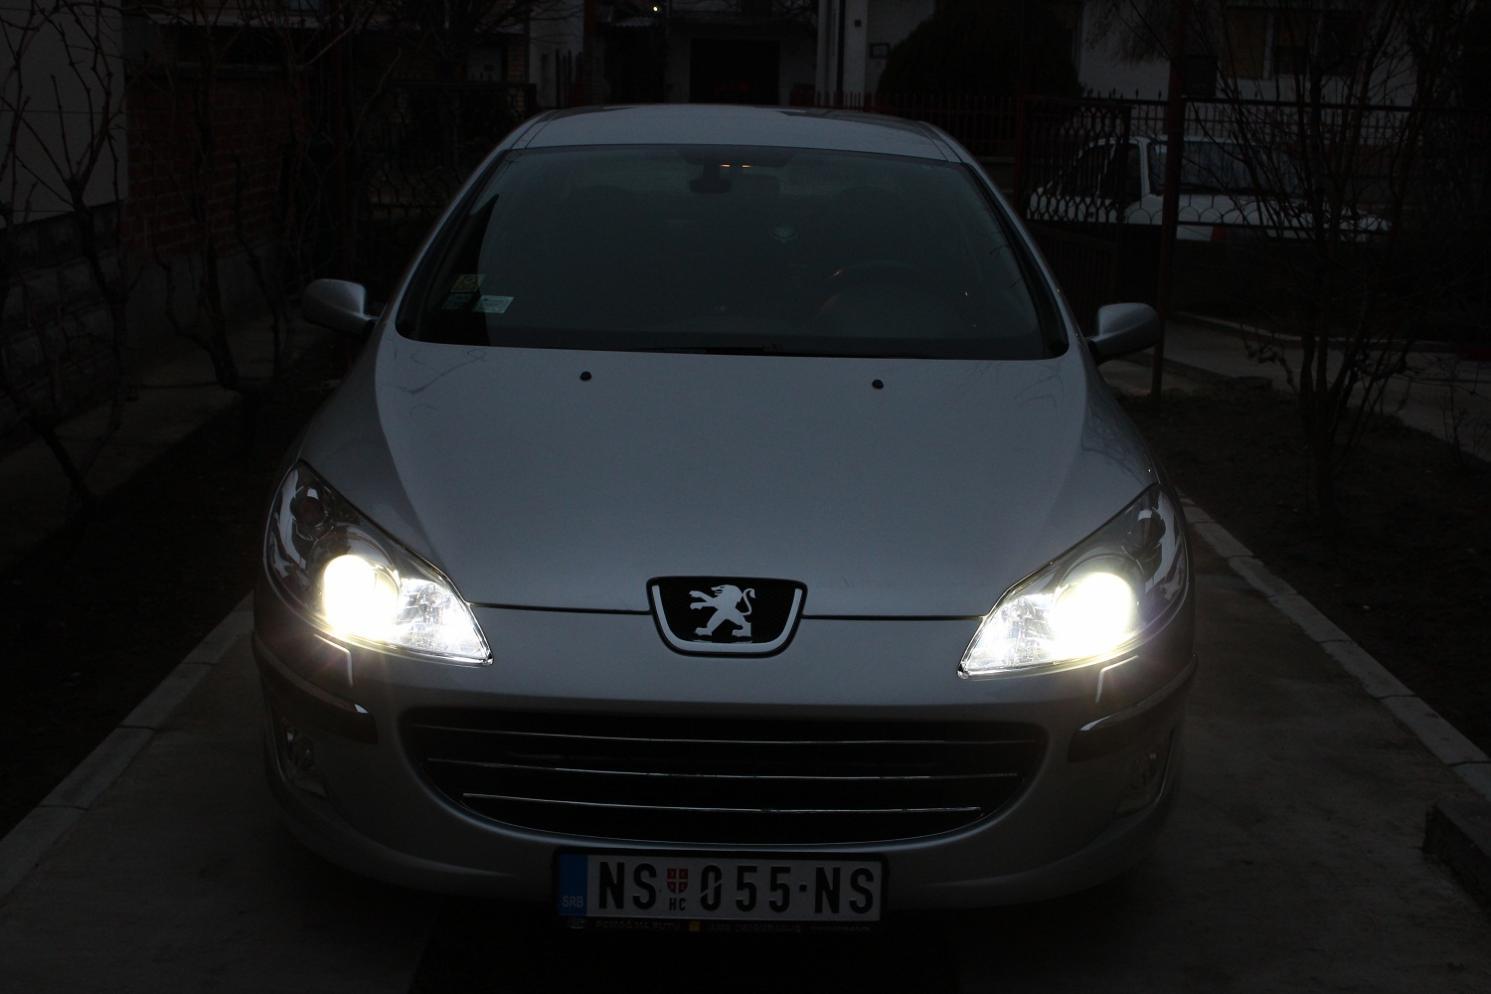 Daylight Peugeot 407 Peugeot Forums